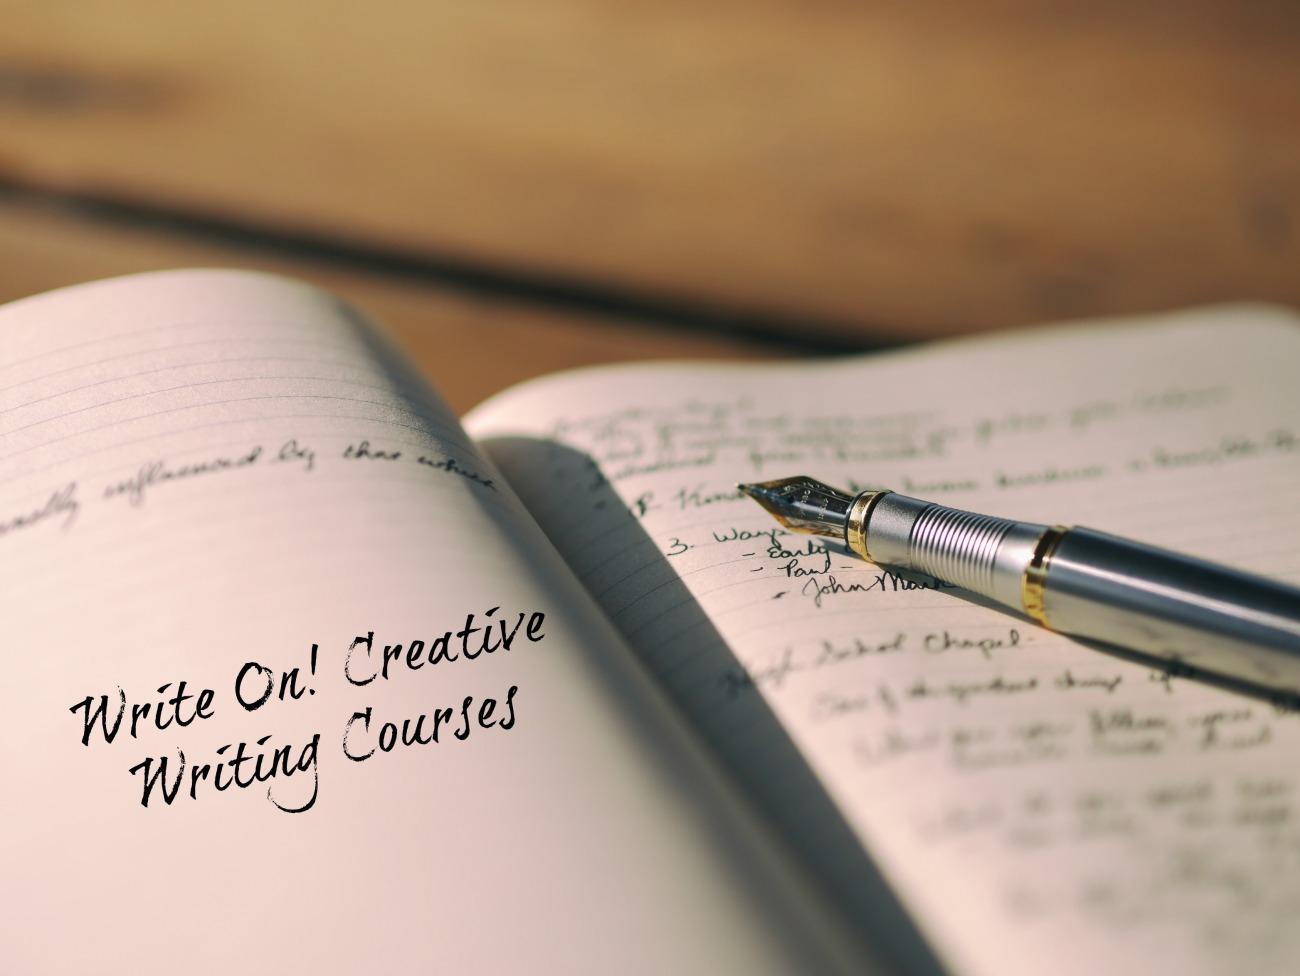 pexels-photo-94327-write-on-creative-writing-courses